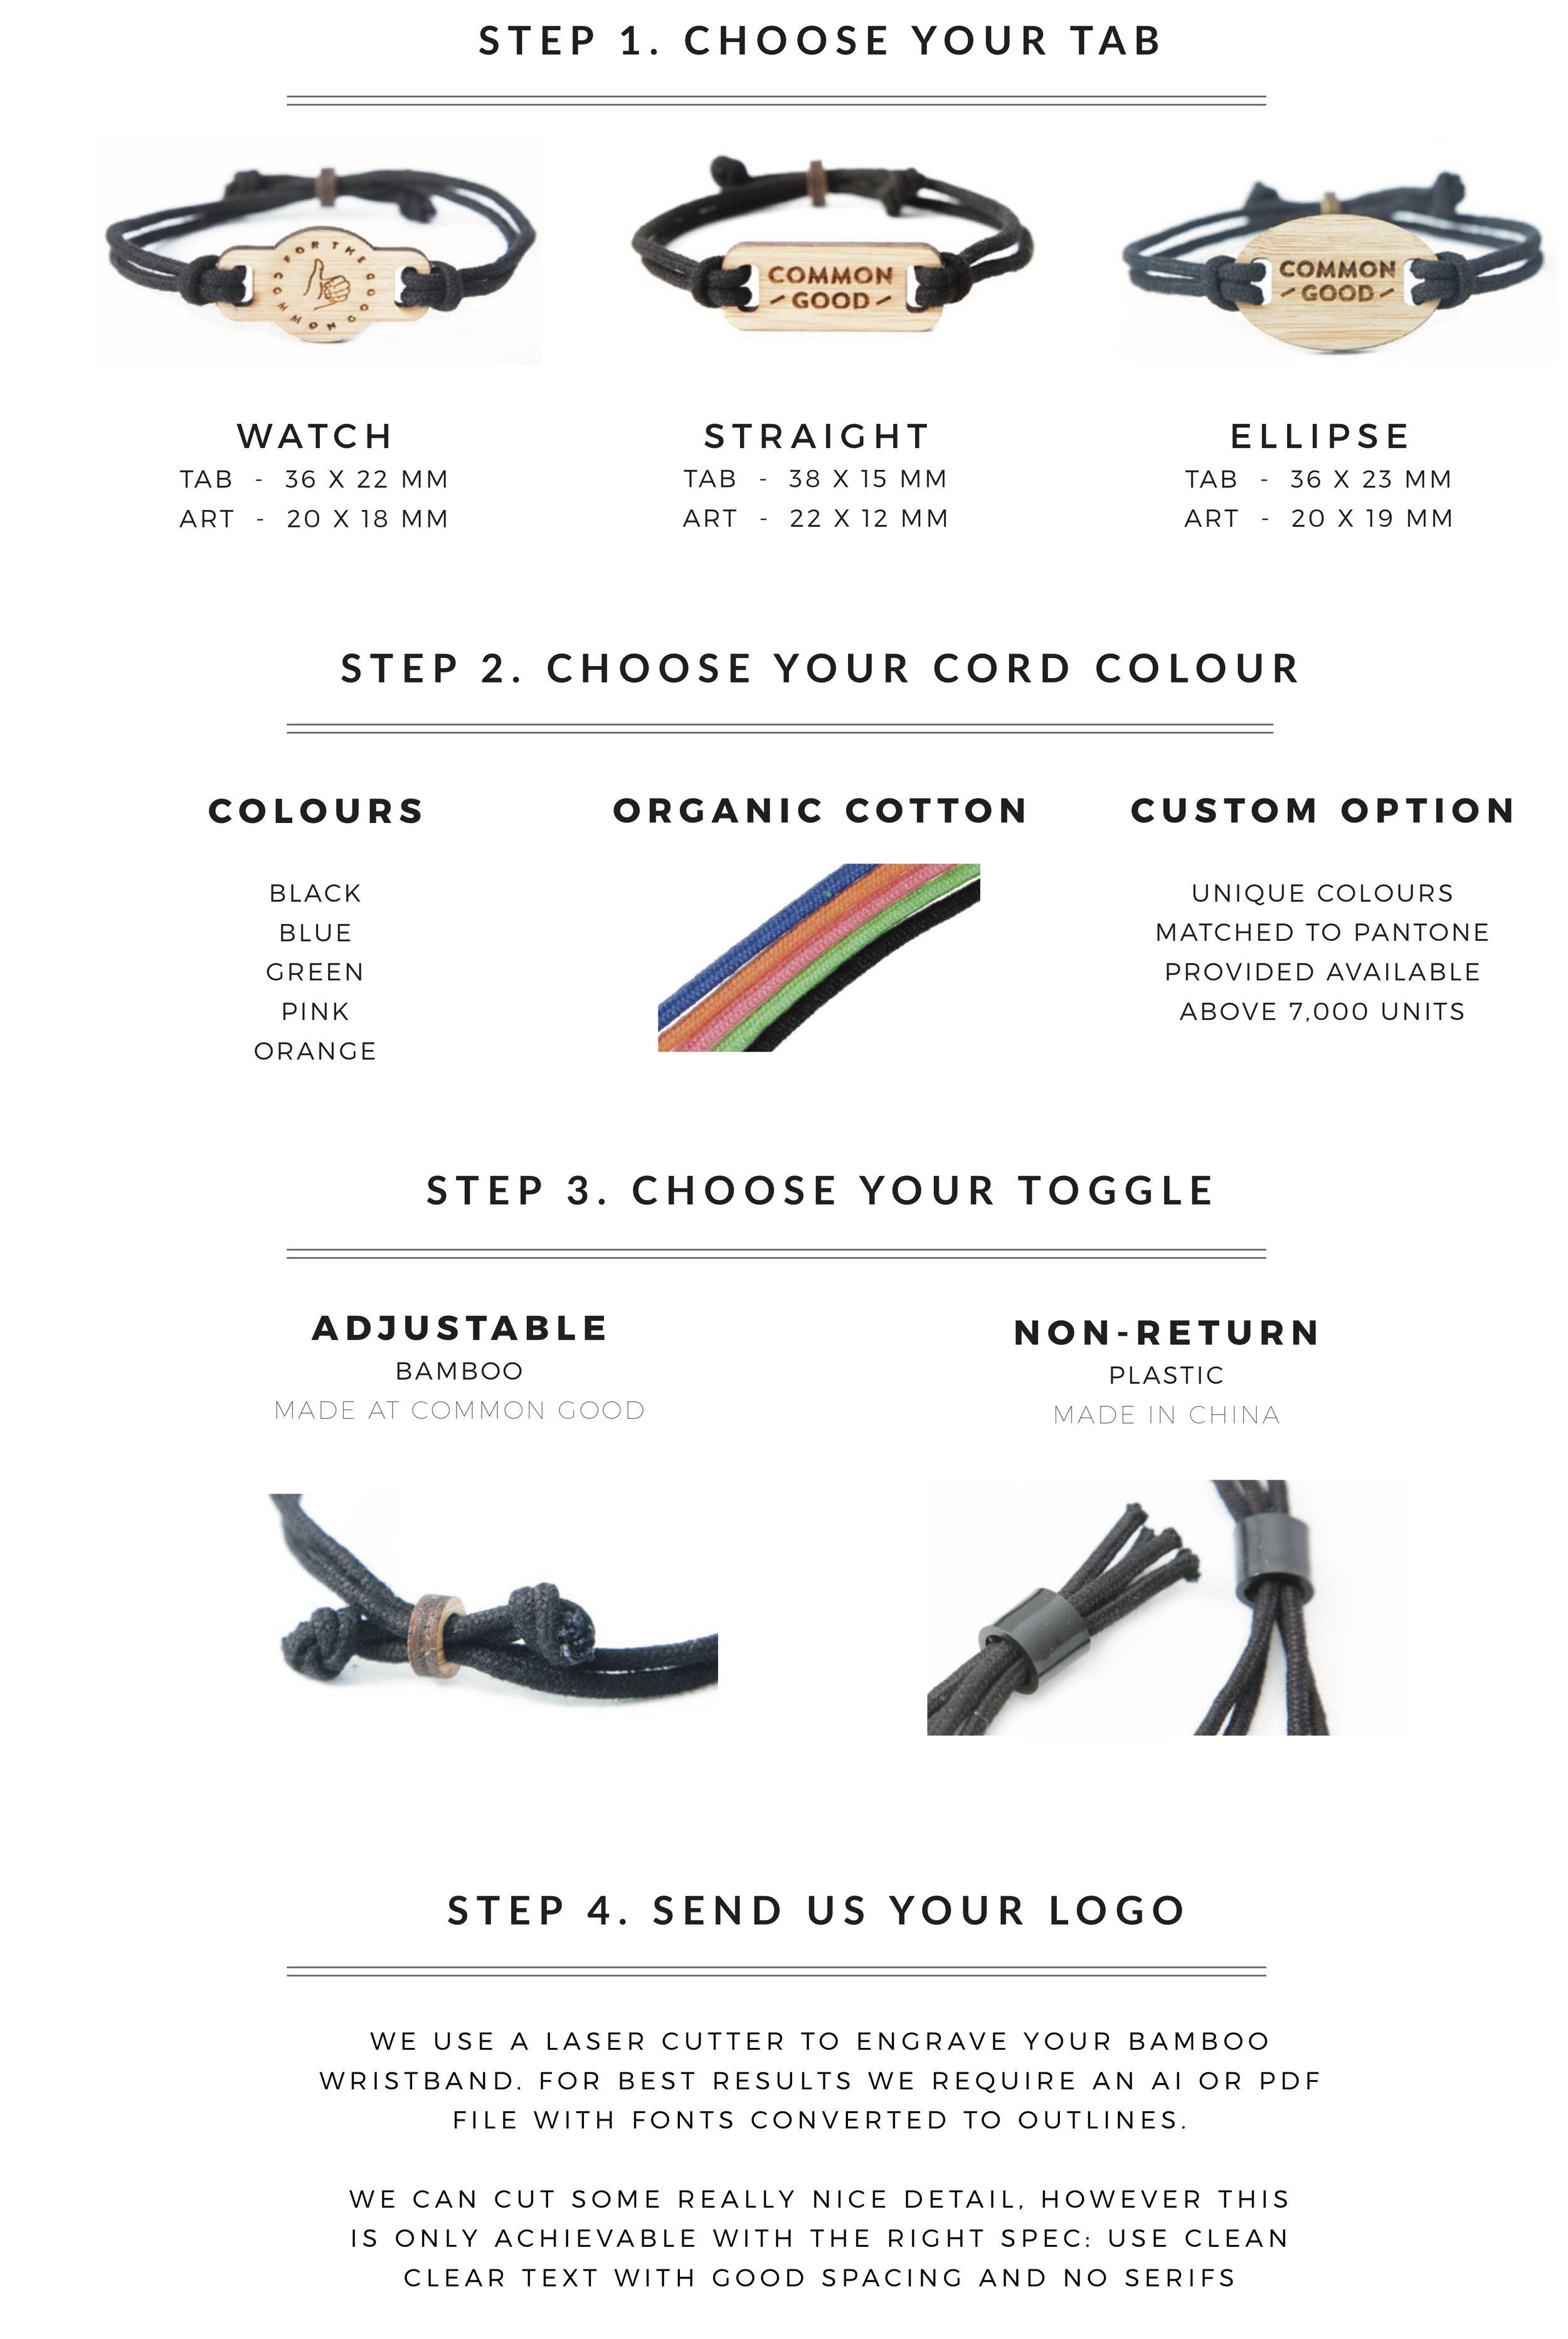 Common Good Wristbands.jpg